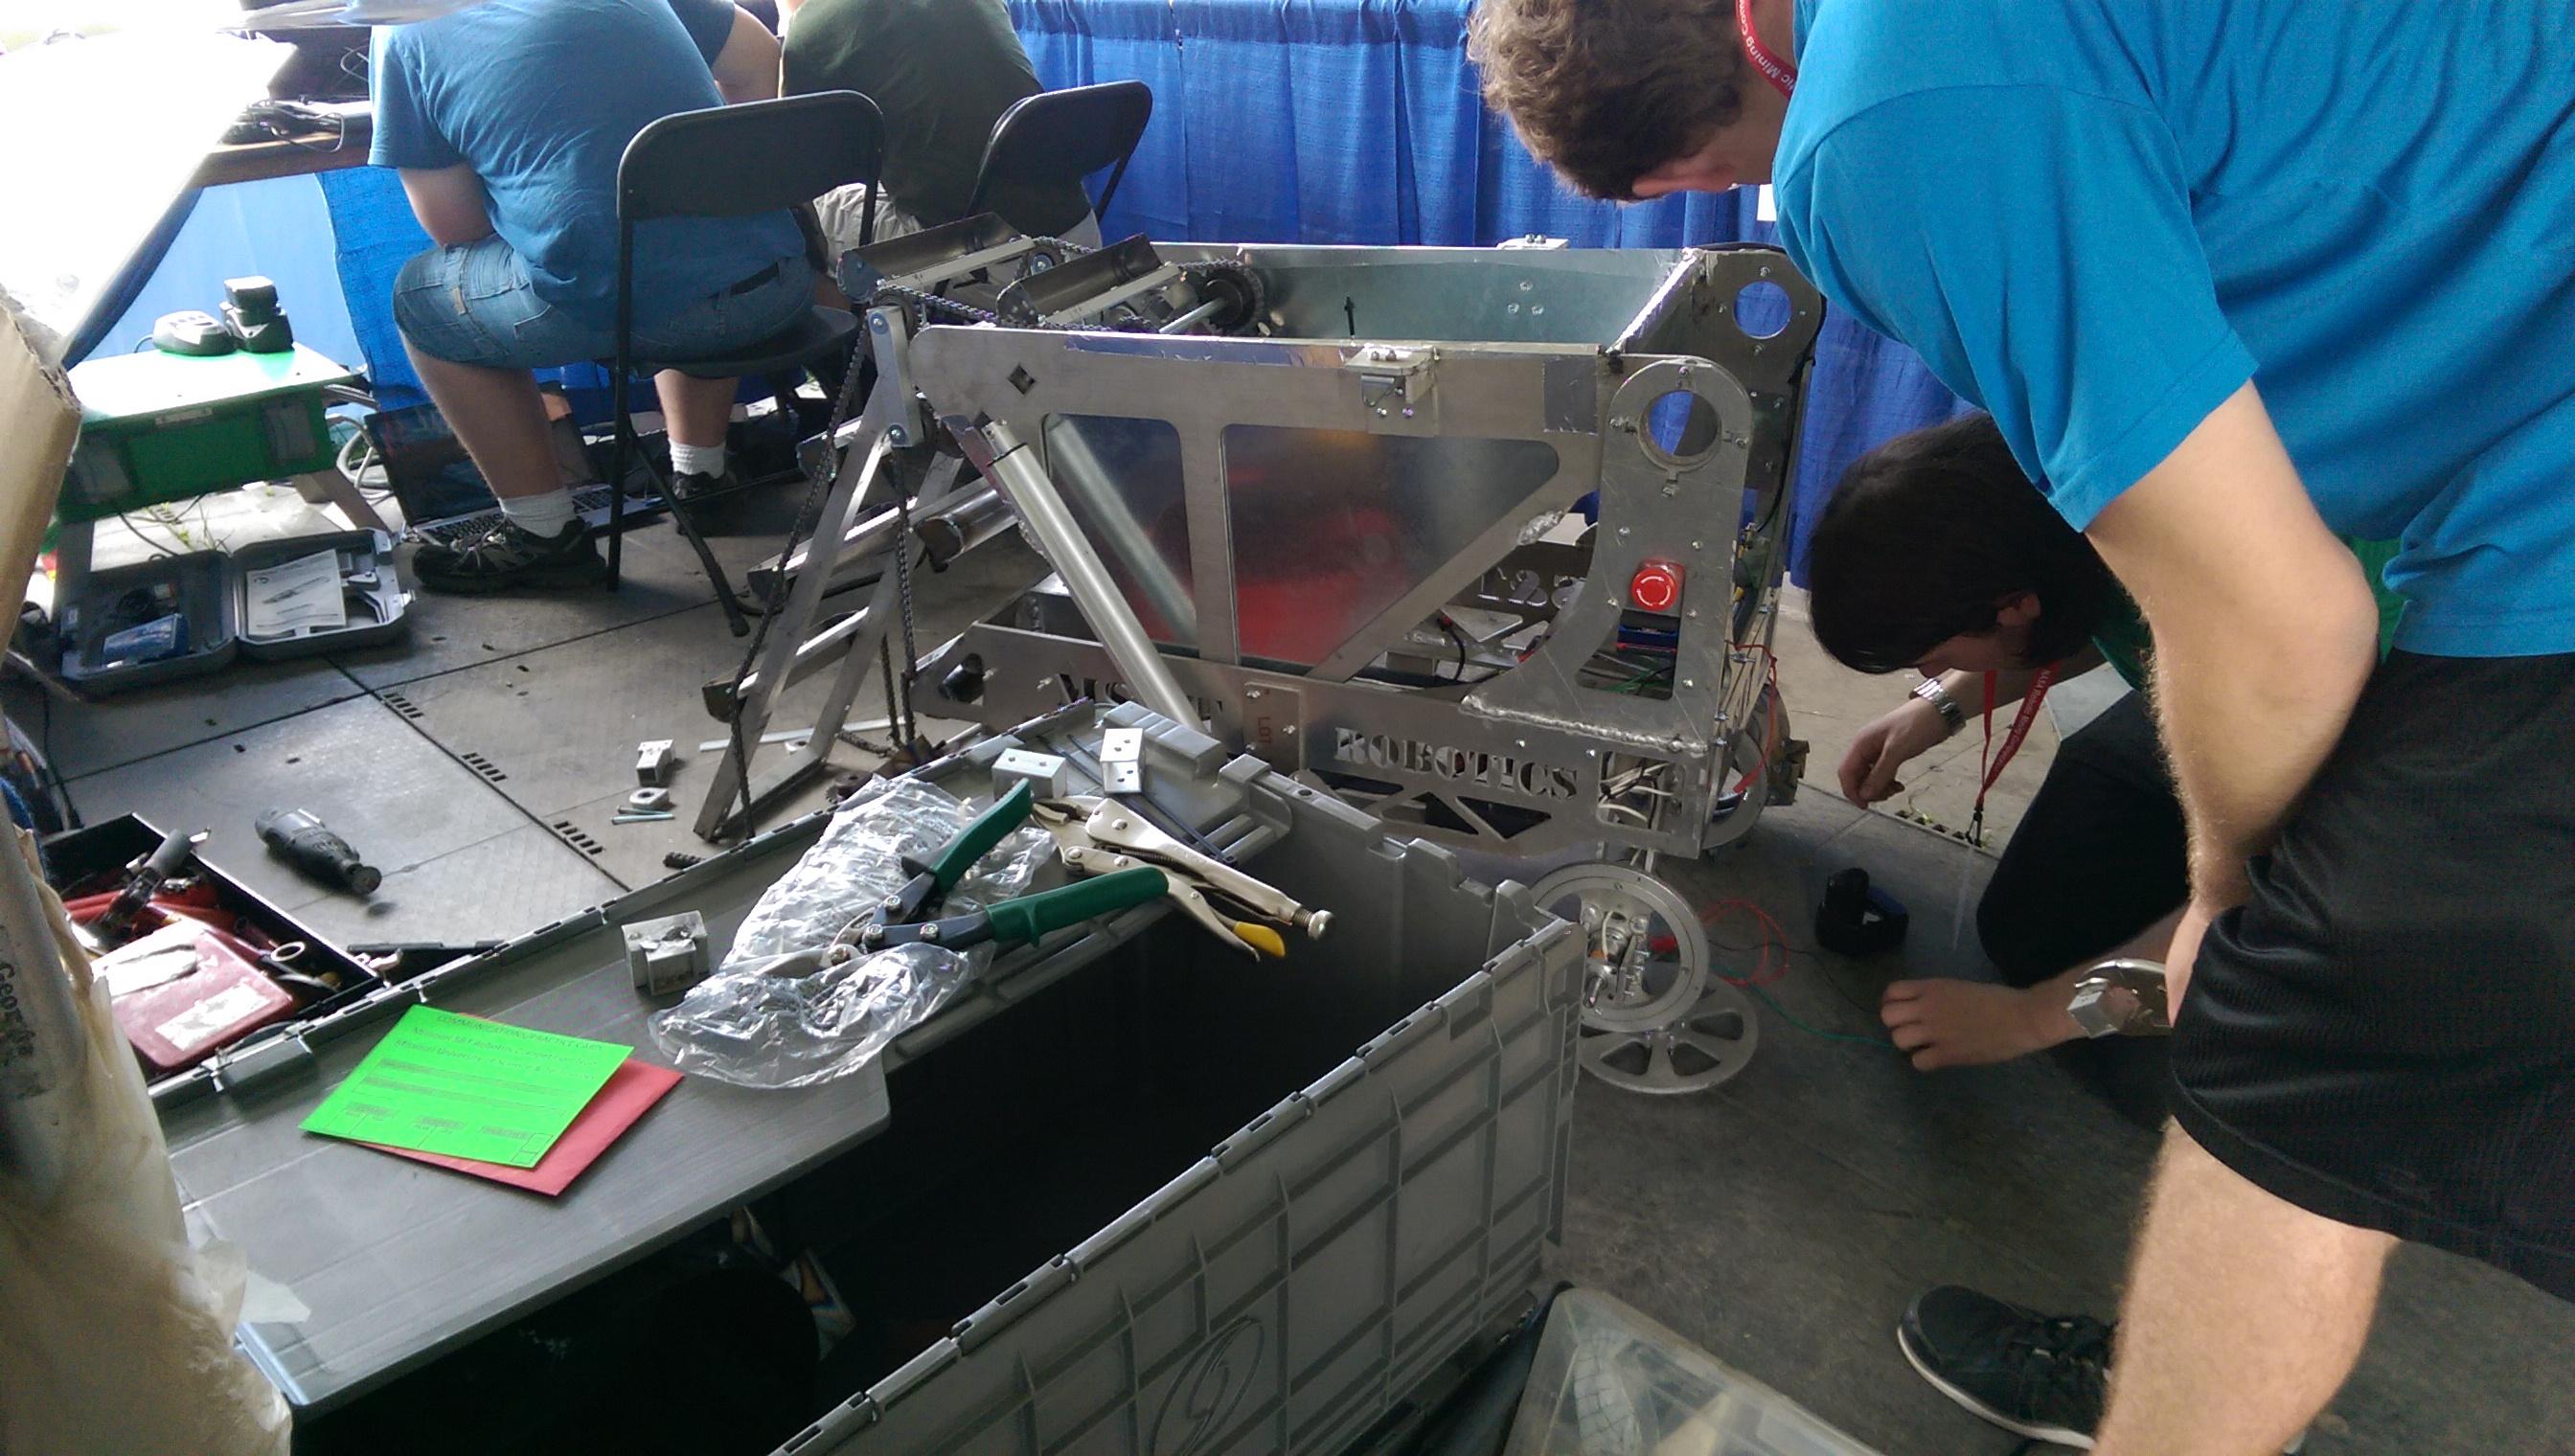 NASA Robotic Mining Competition 2015